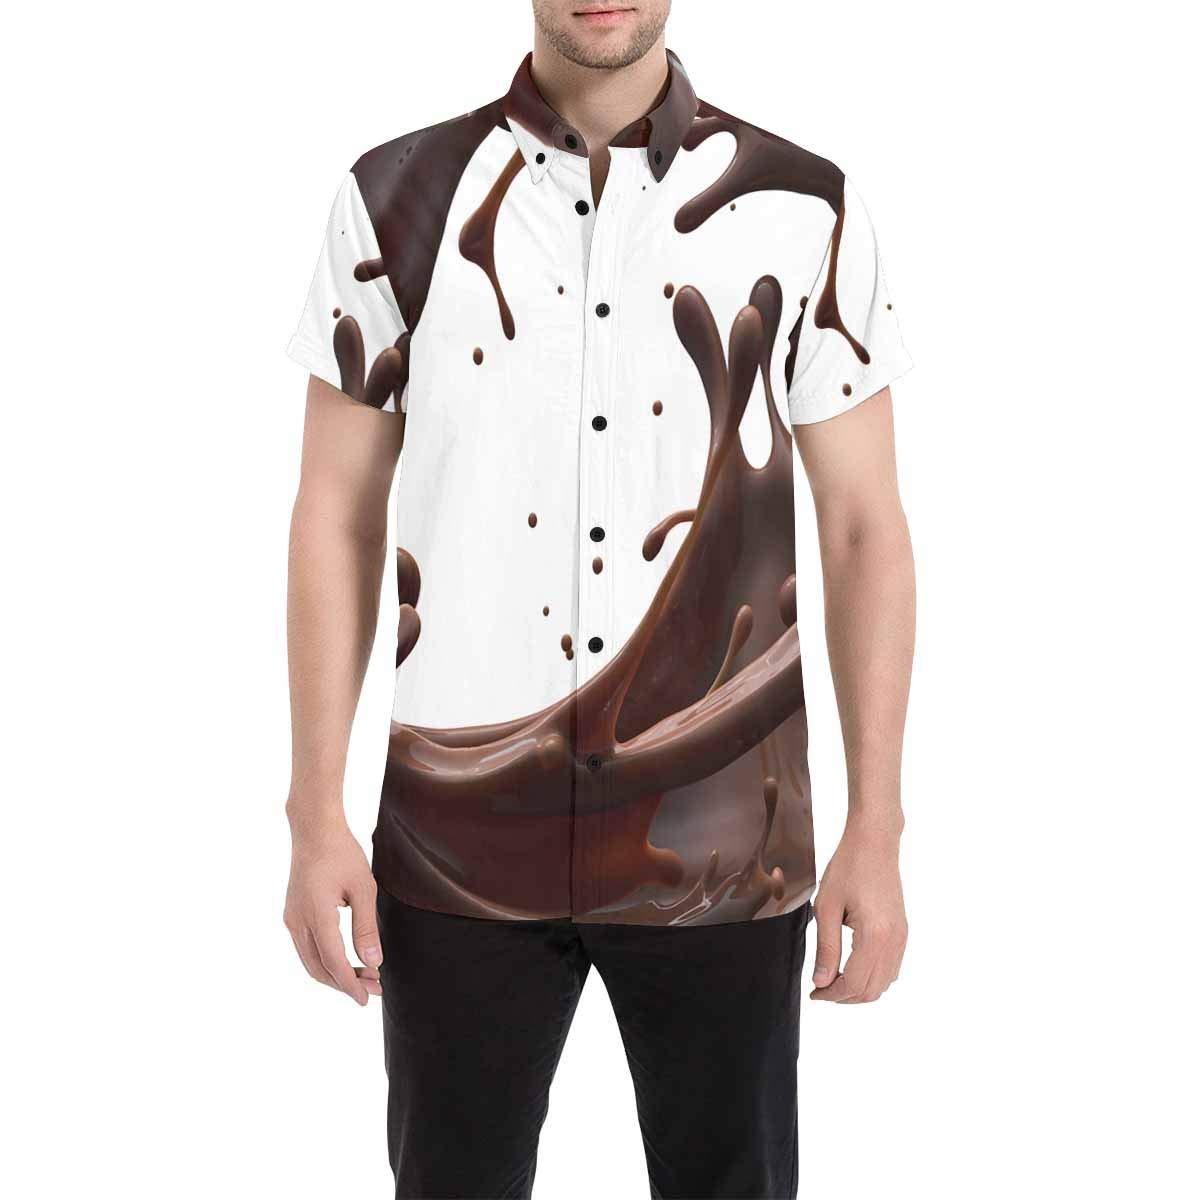 InterestPrint Mens Casual Shirt Emotions Emoicons in Galaxy T Shirts Casual Short Sleeve Tee Shirts